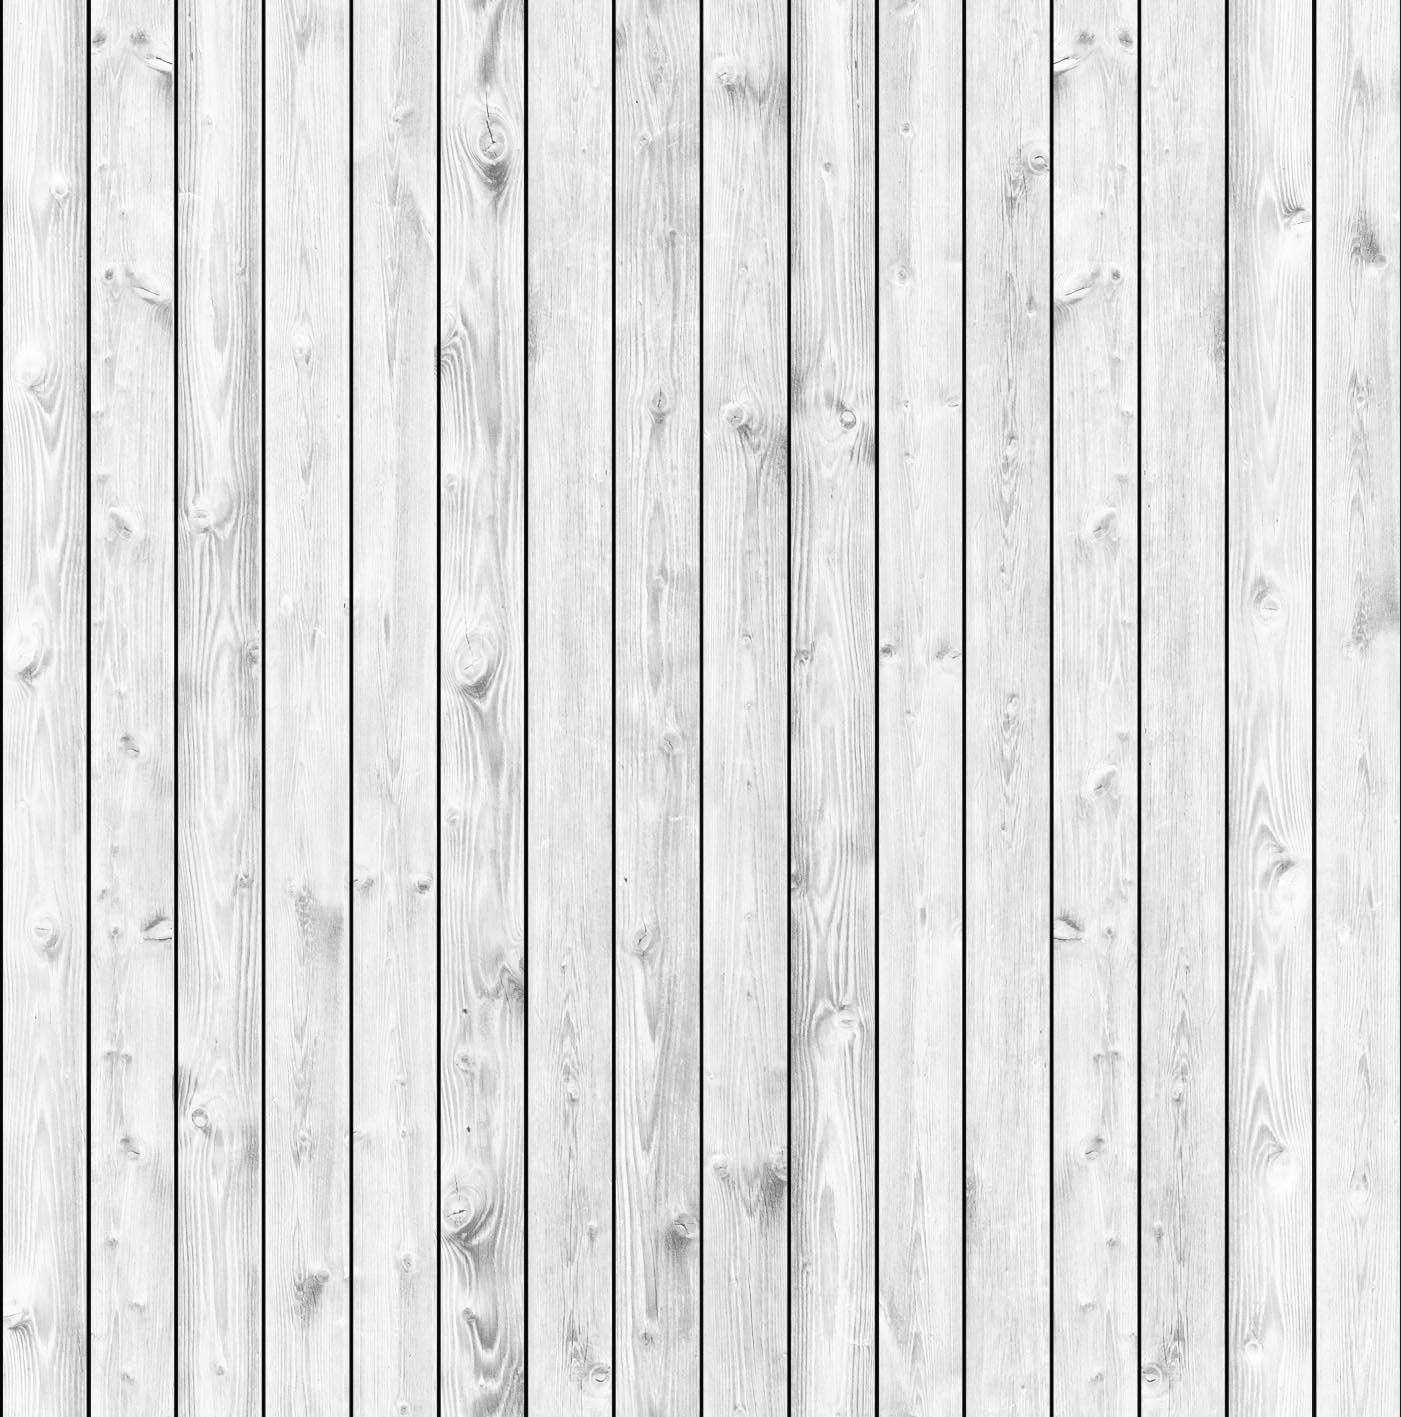 Simo 3d Blogspot Com Texture Seamless Legno Vari Colori